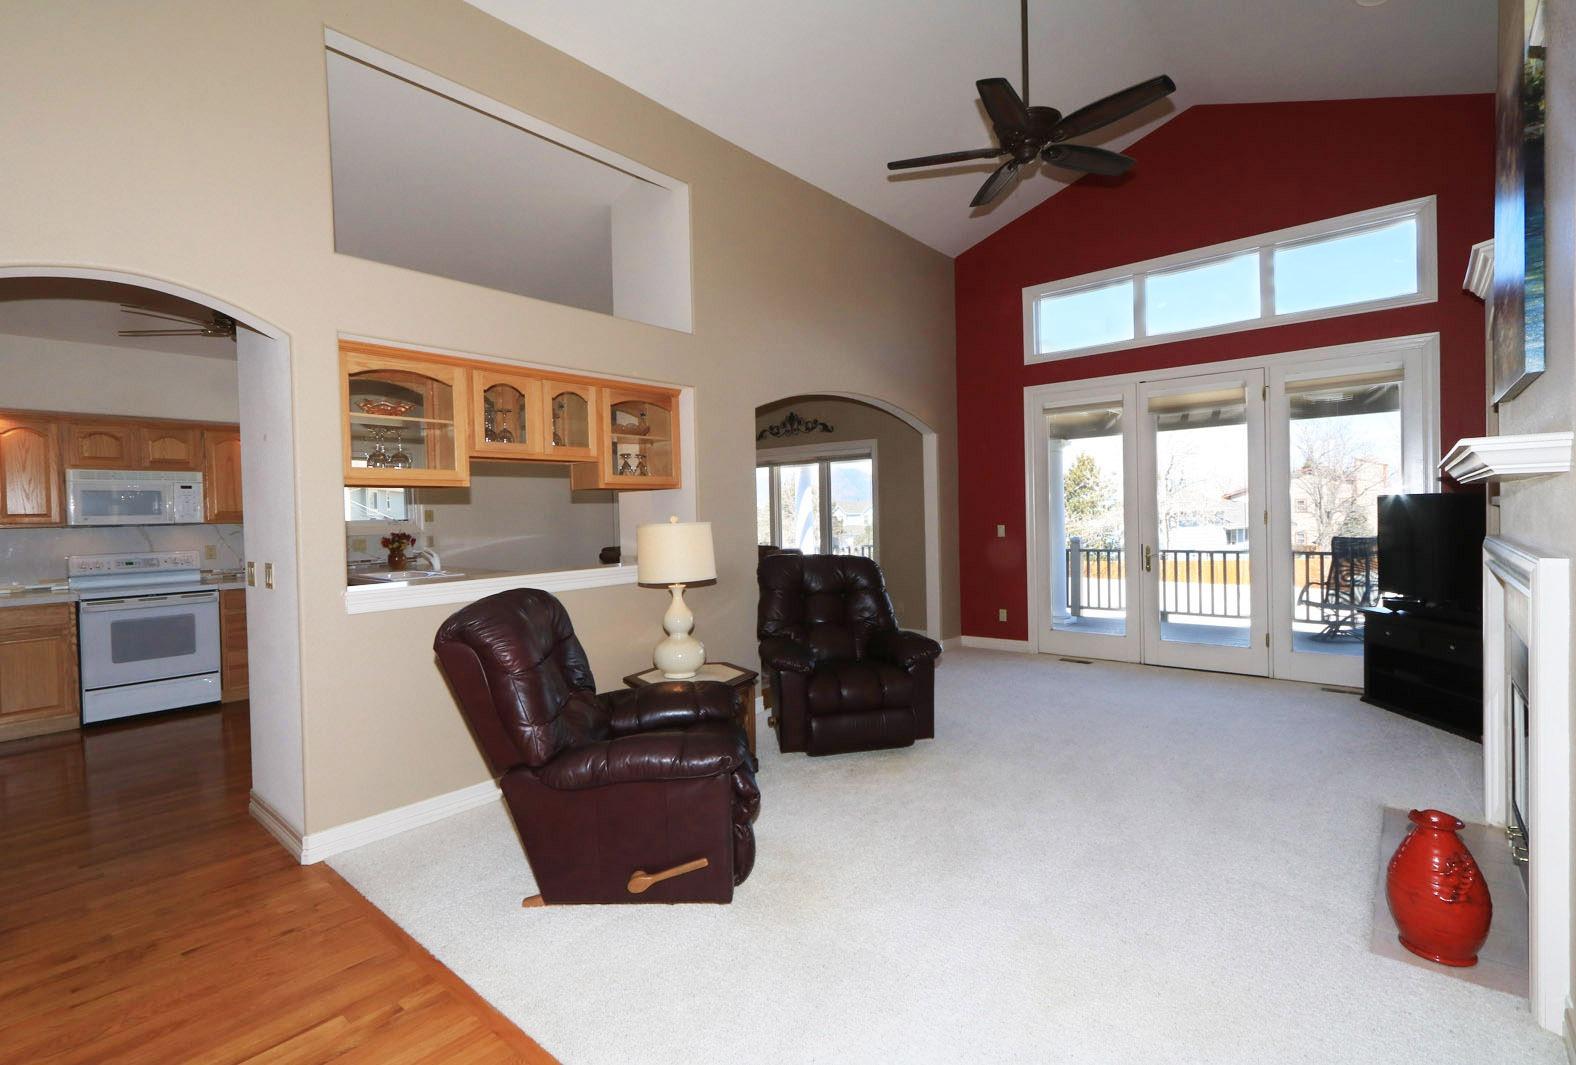 Living Room 19' X 14'